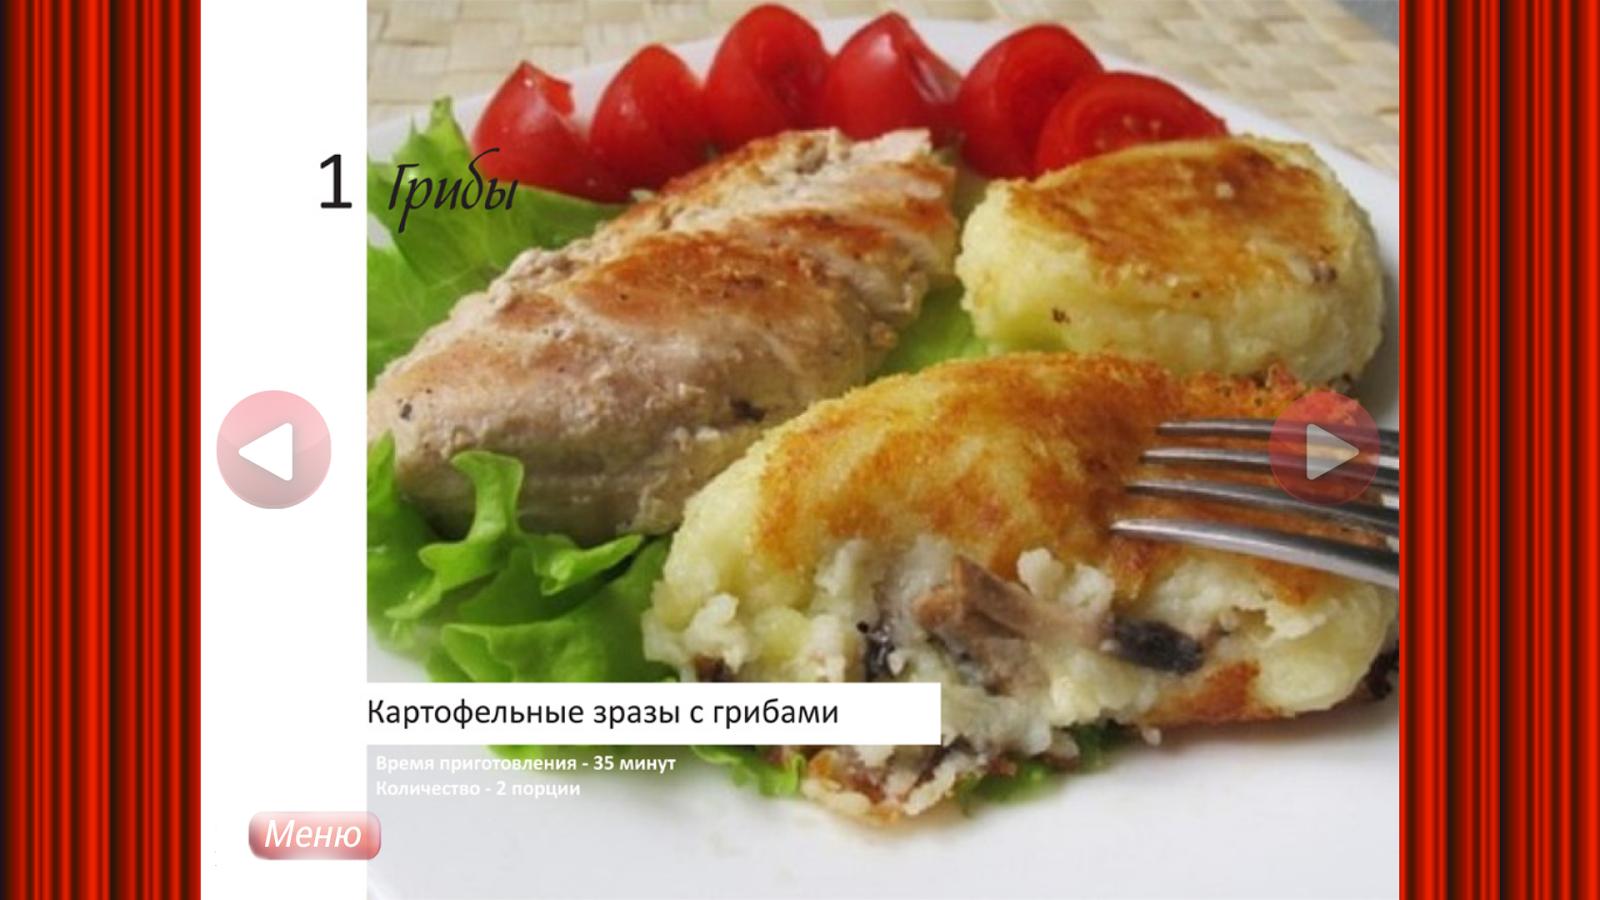 Грибы - кулинария, рецепты - screenshot